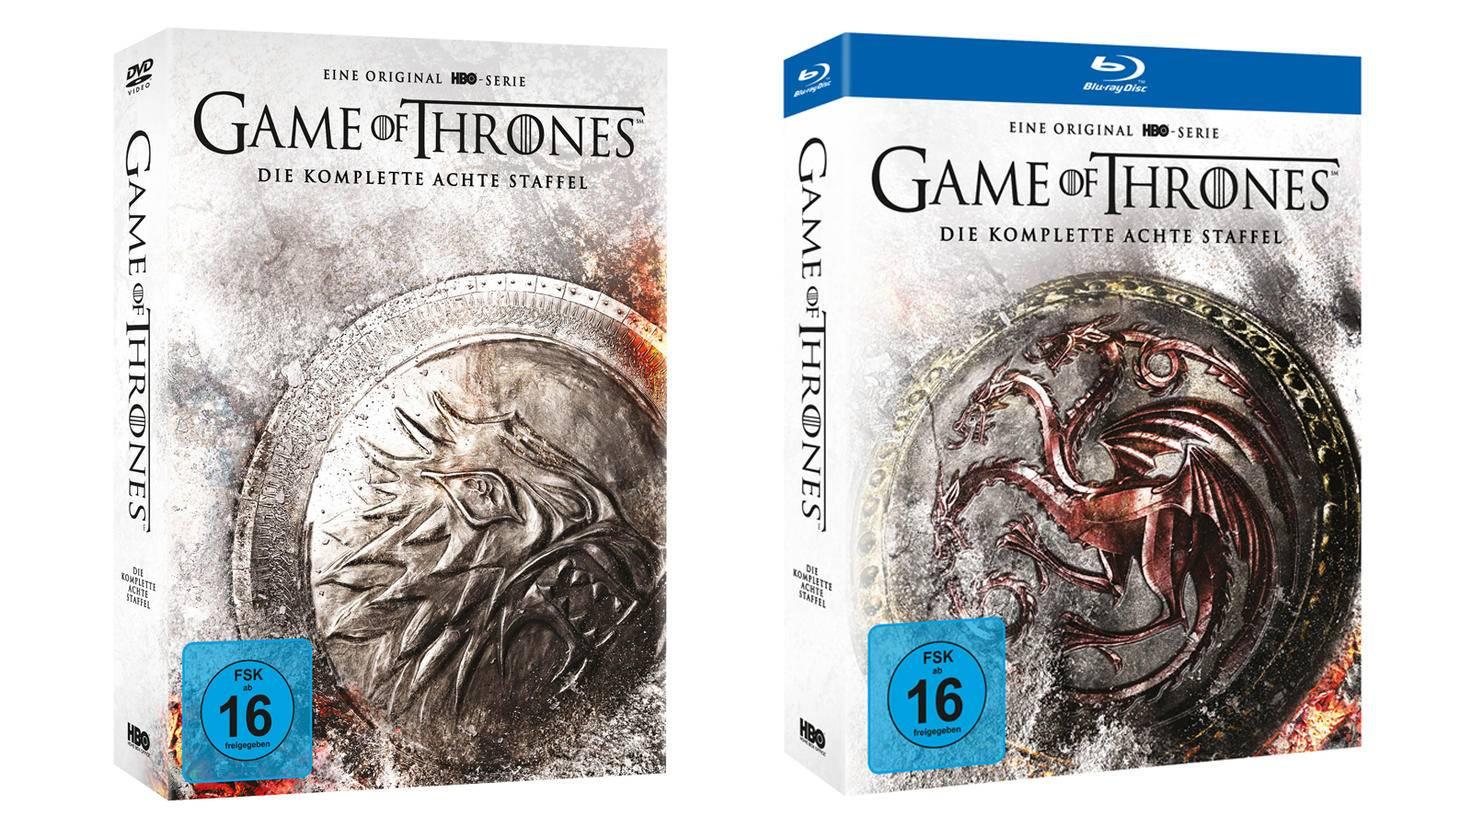 Game of Thrones Staffel 8 SE Packshot